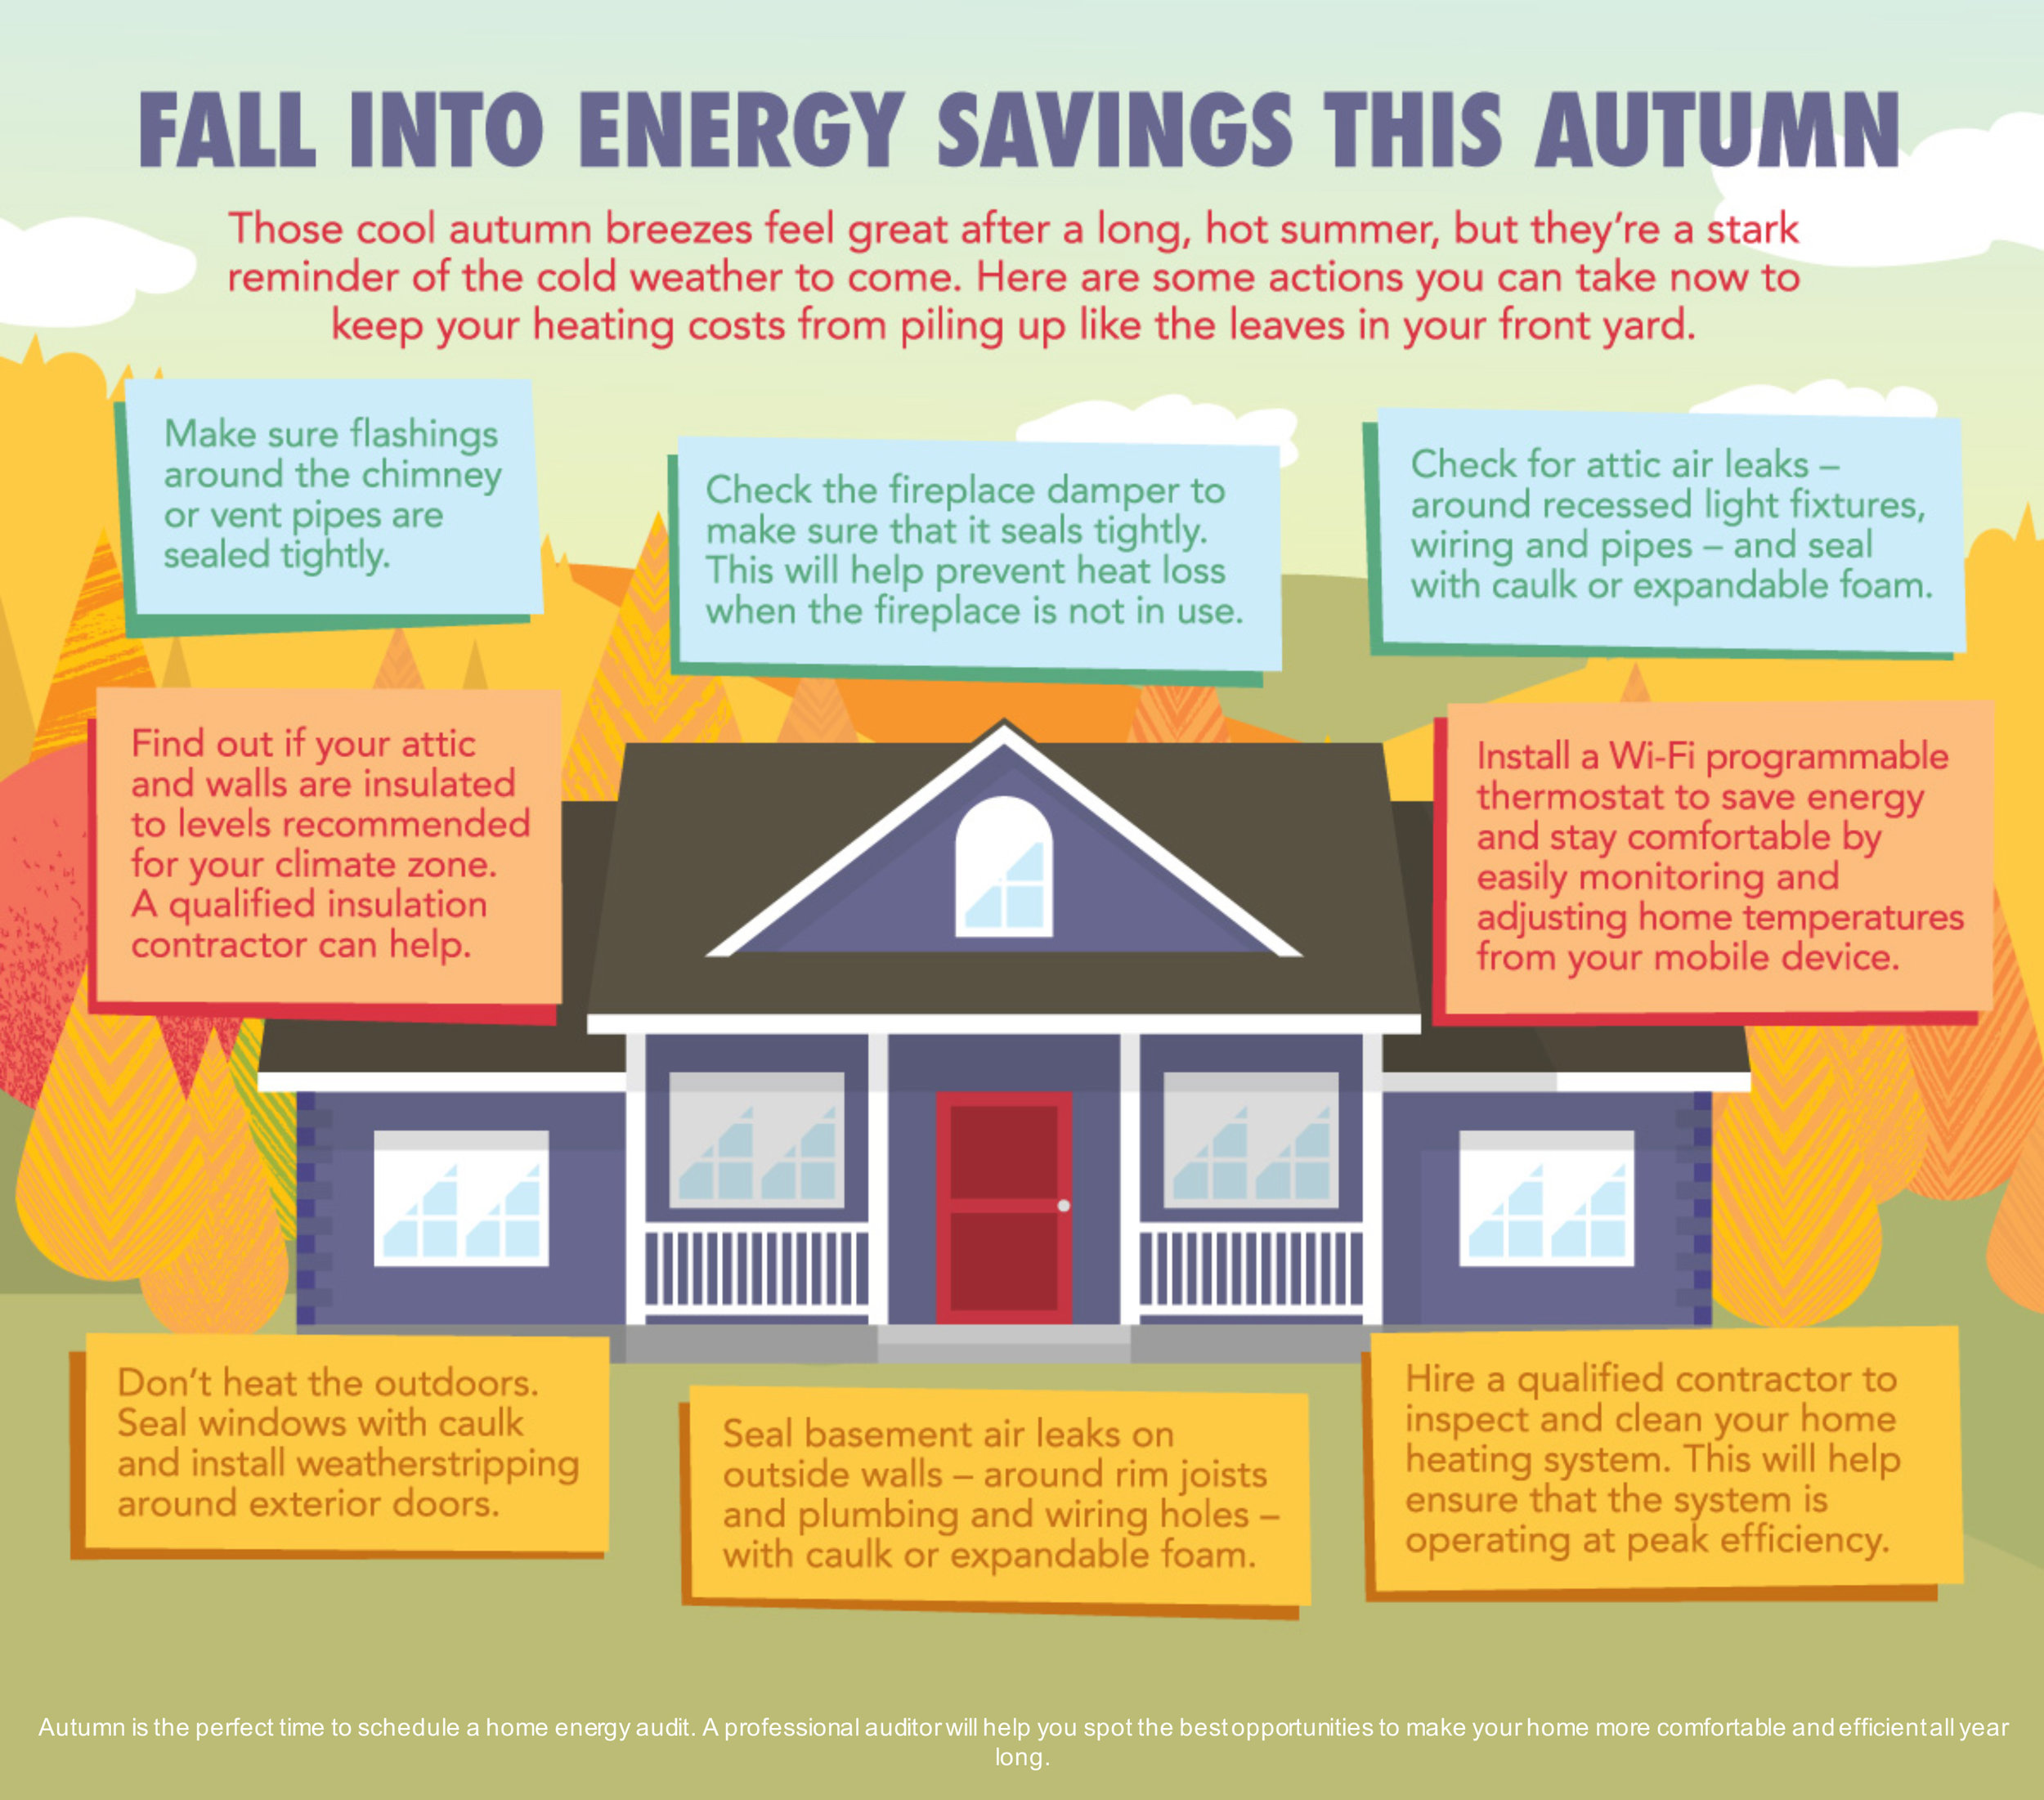 Fall into Energy Saving this Autumn